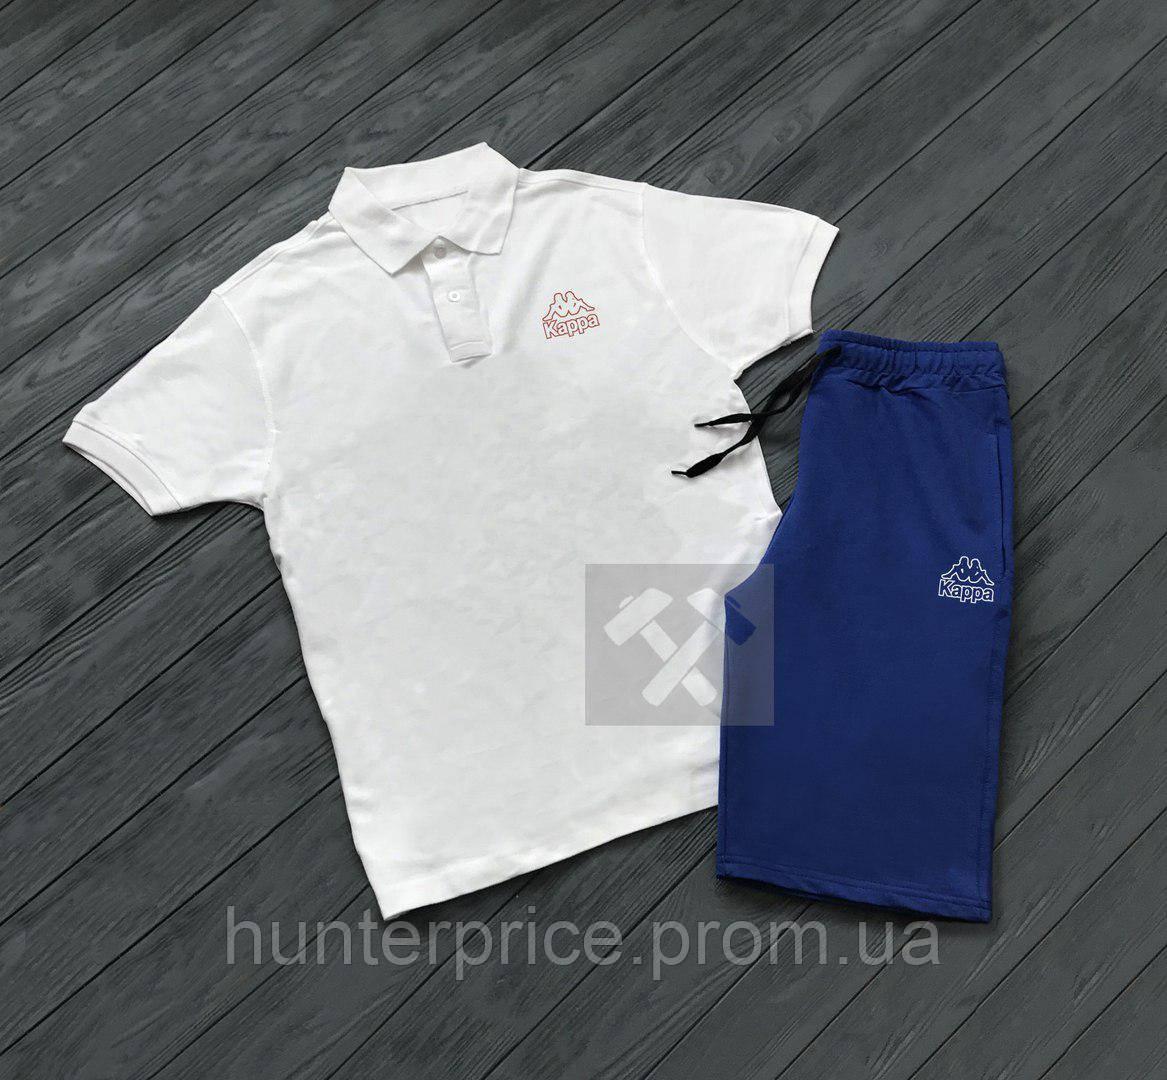 939ef84411ab Комплект белая футболка поло и синие шорты Kappa   Белая тениска Kappa    Синие шорты Kappa